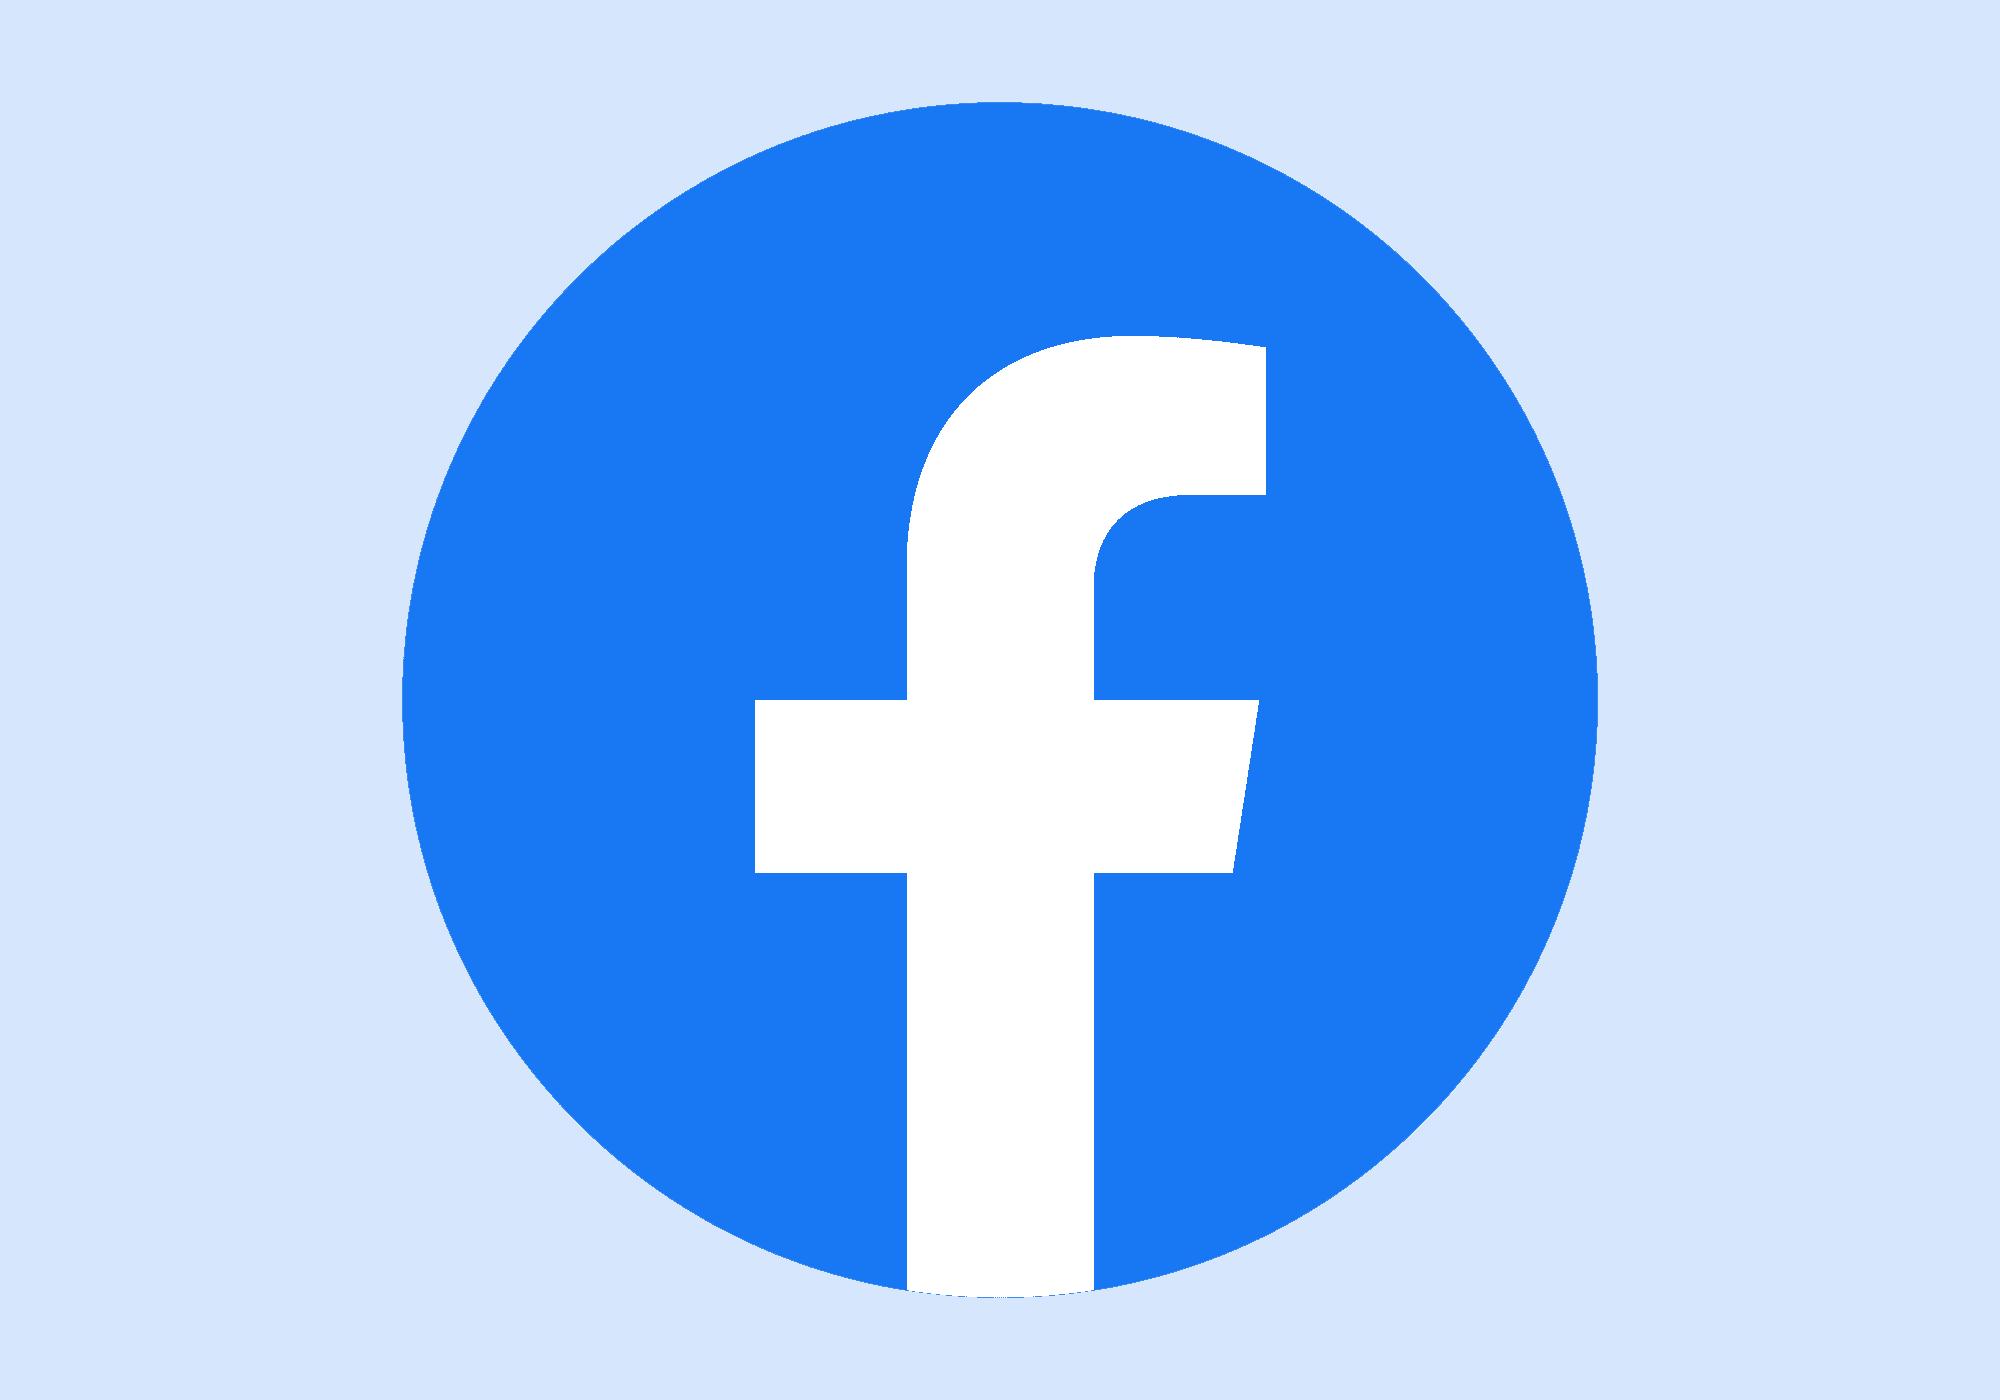 Facebook Marketing Agency London - Facebook Advertising Agency London